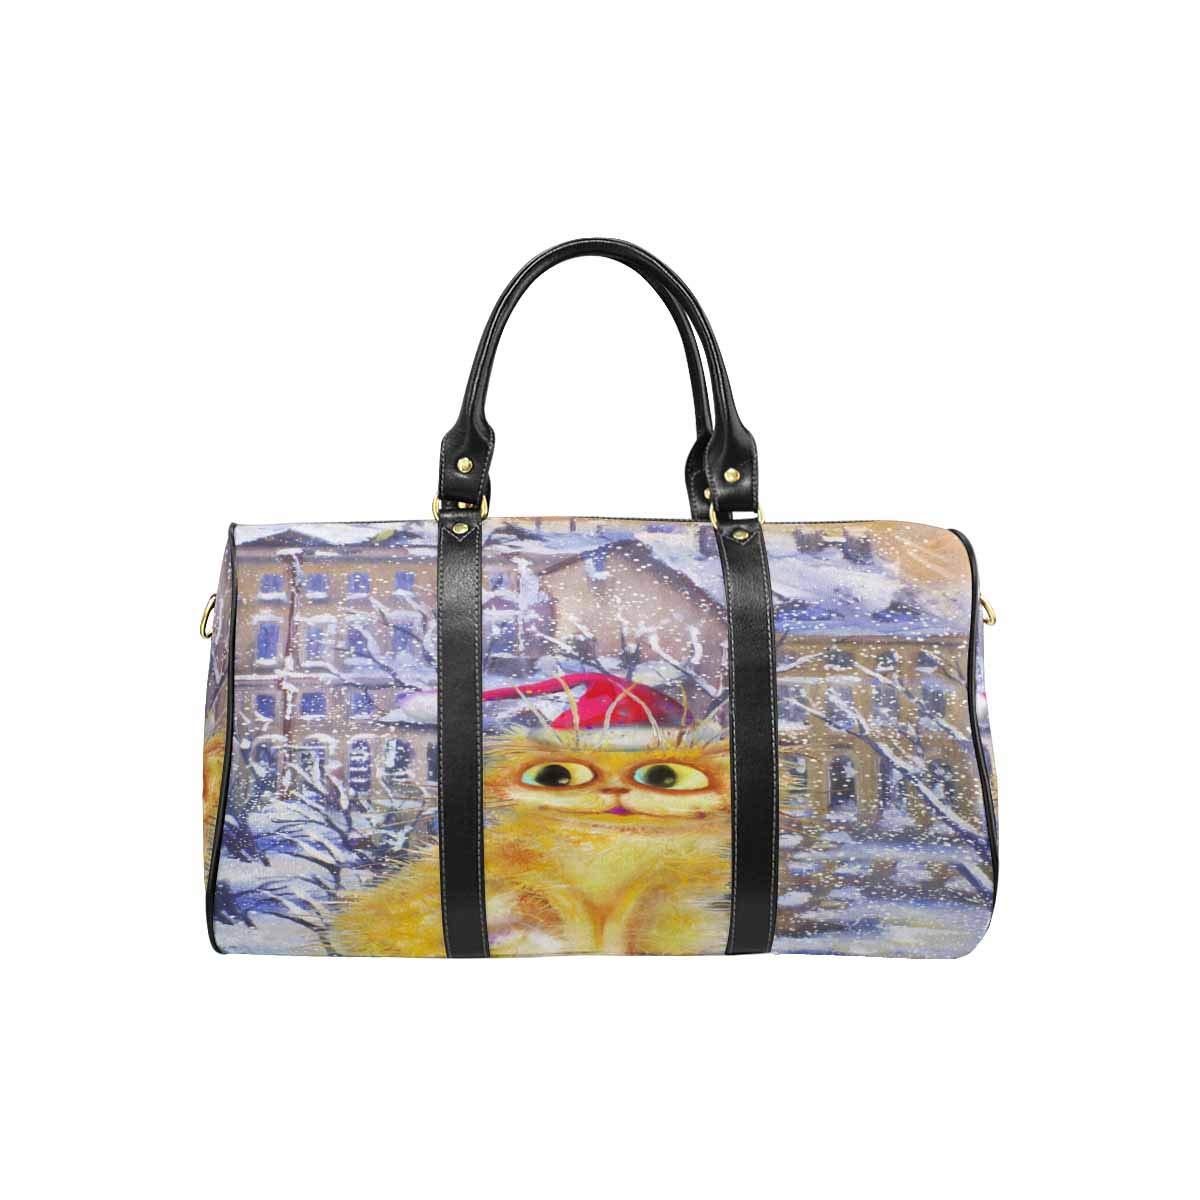 InterestPrint Carry-on Garment Bag Travel Bag Duffel Bag Weekend Bag Boy and Girl Wearing Hat